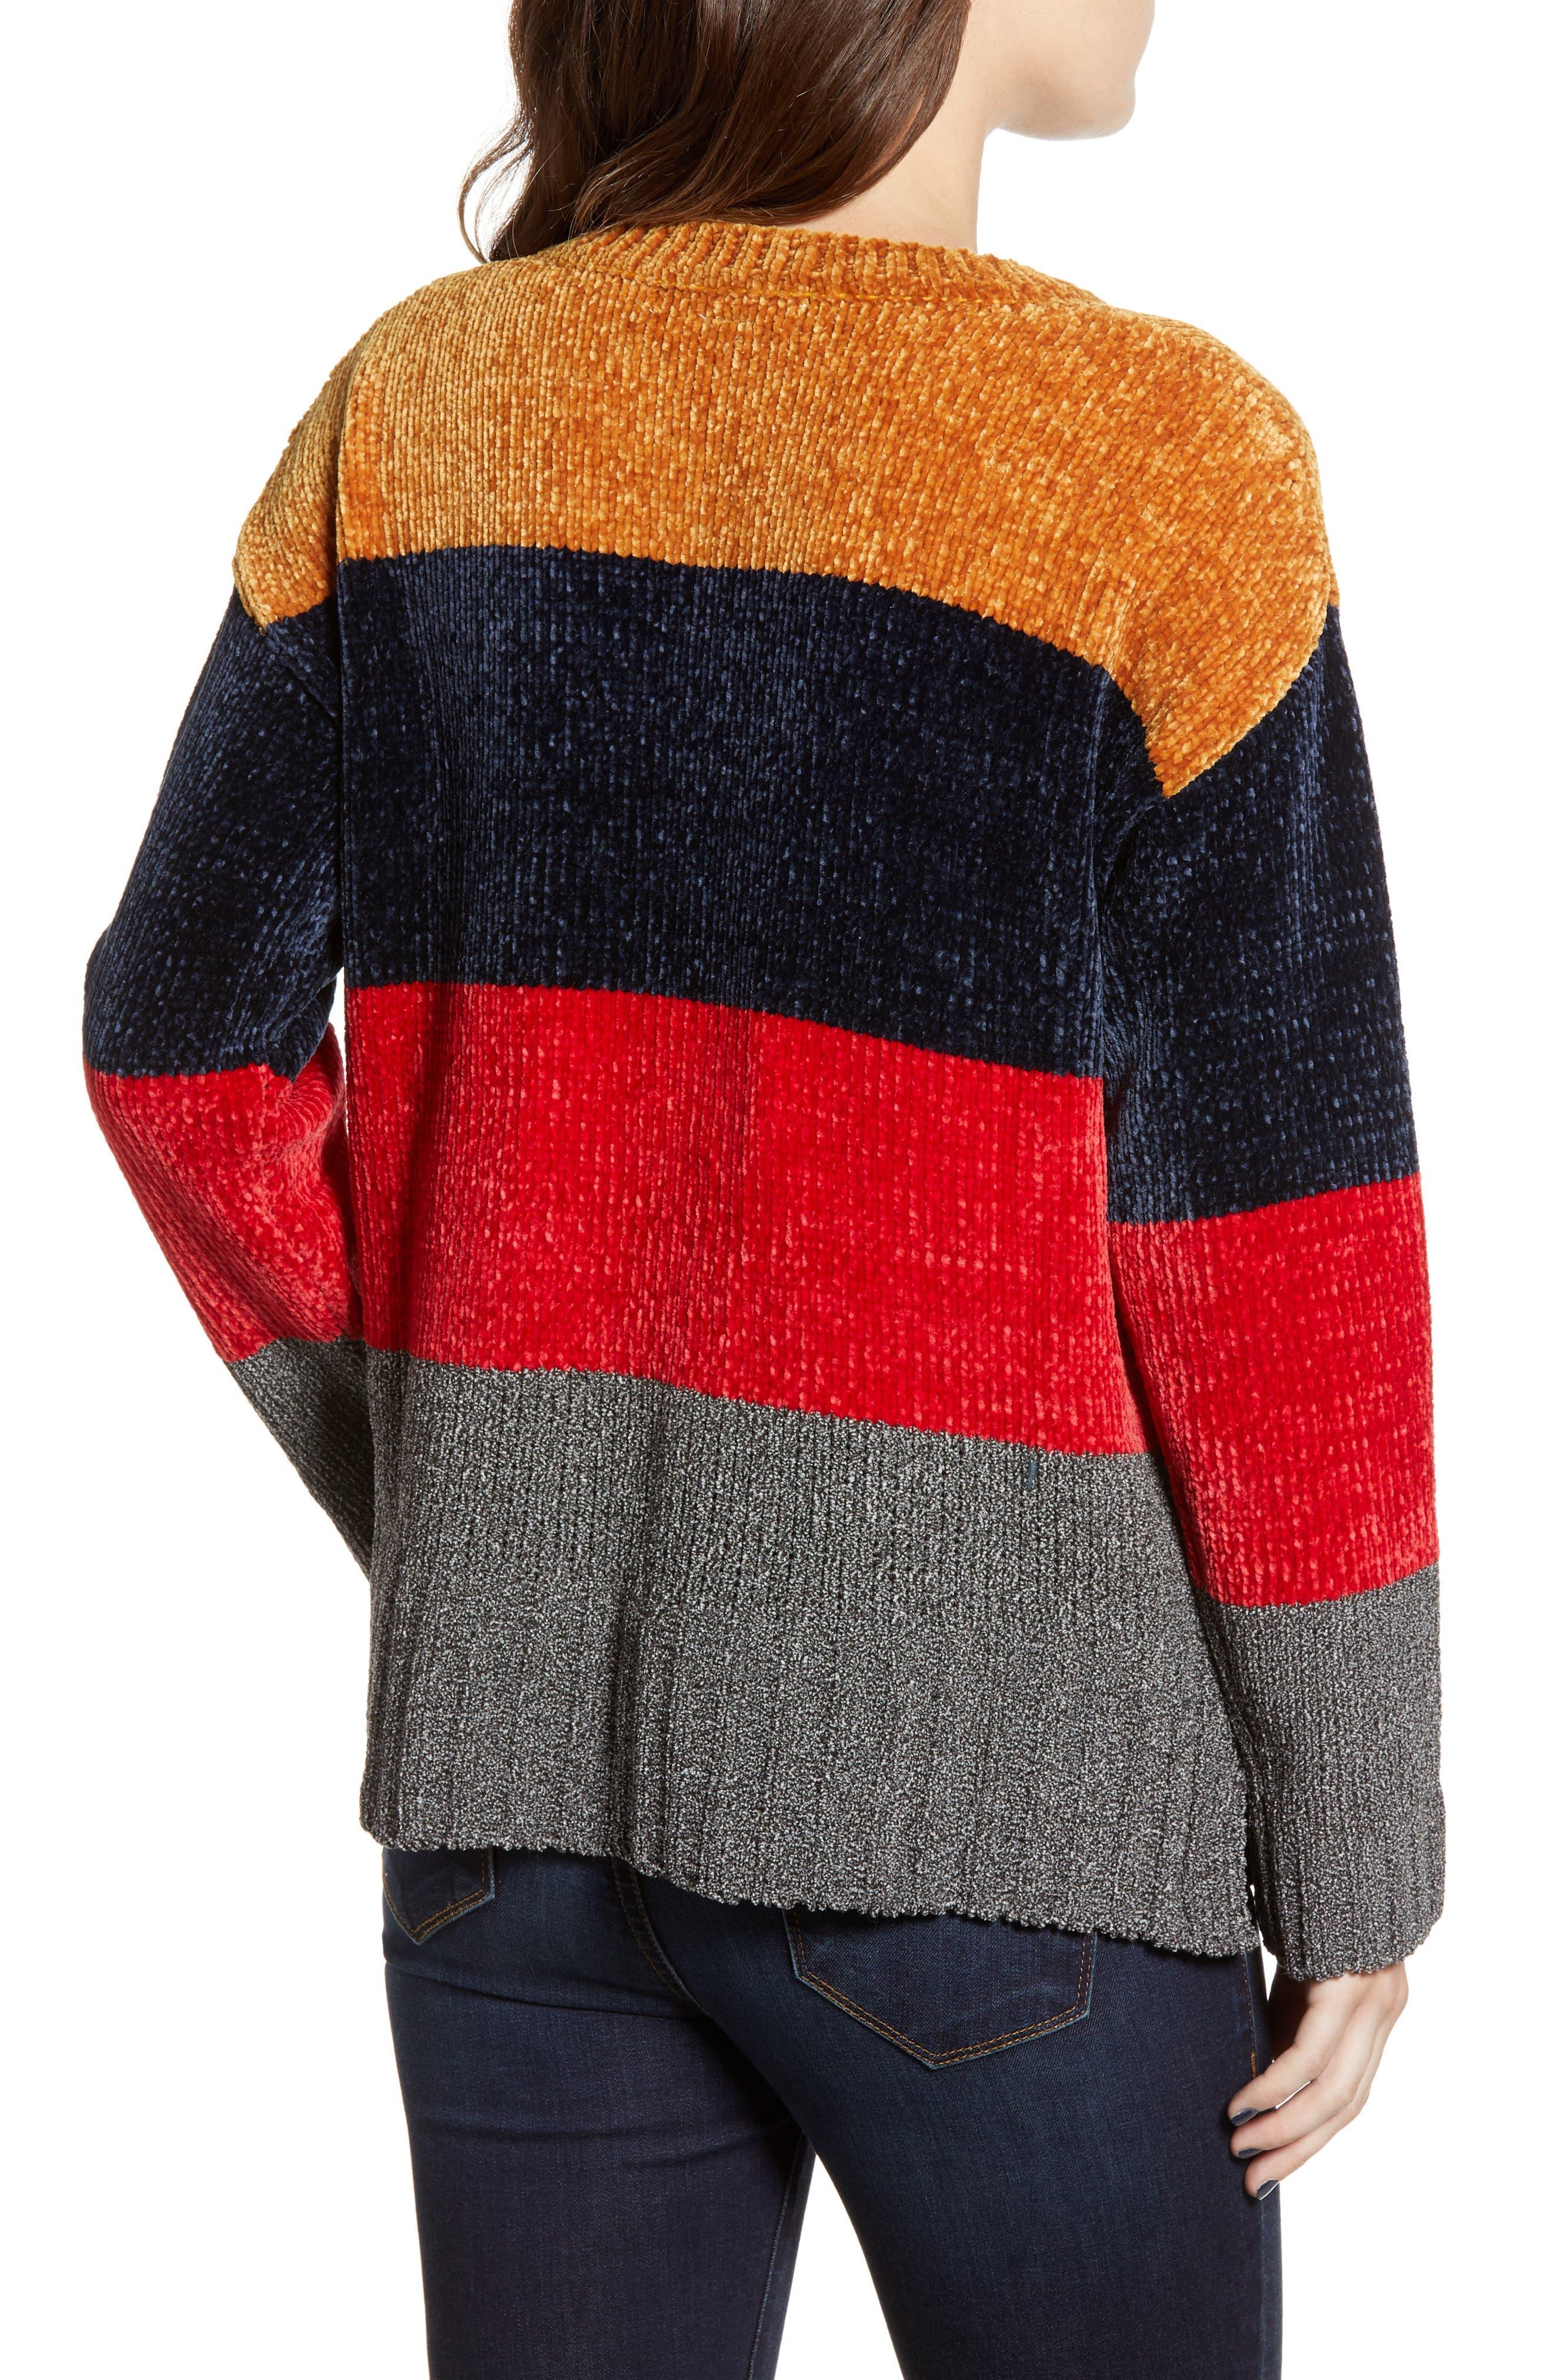 COTTON EMPORIUM,                             Stripe Chenille Sweater,                             Alternate thumbnail 2, color,                             710